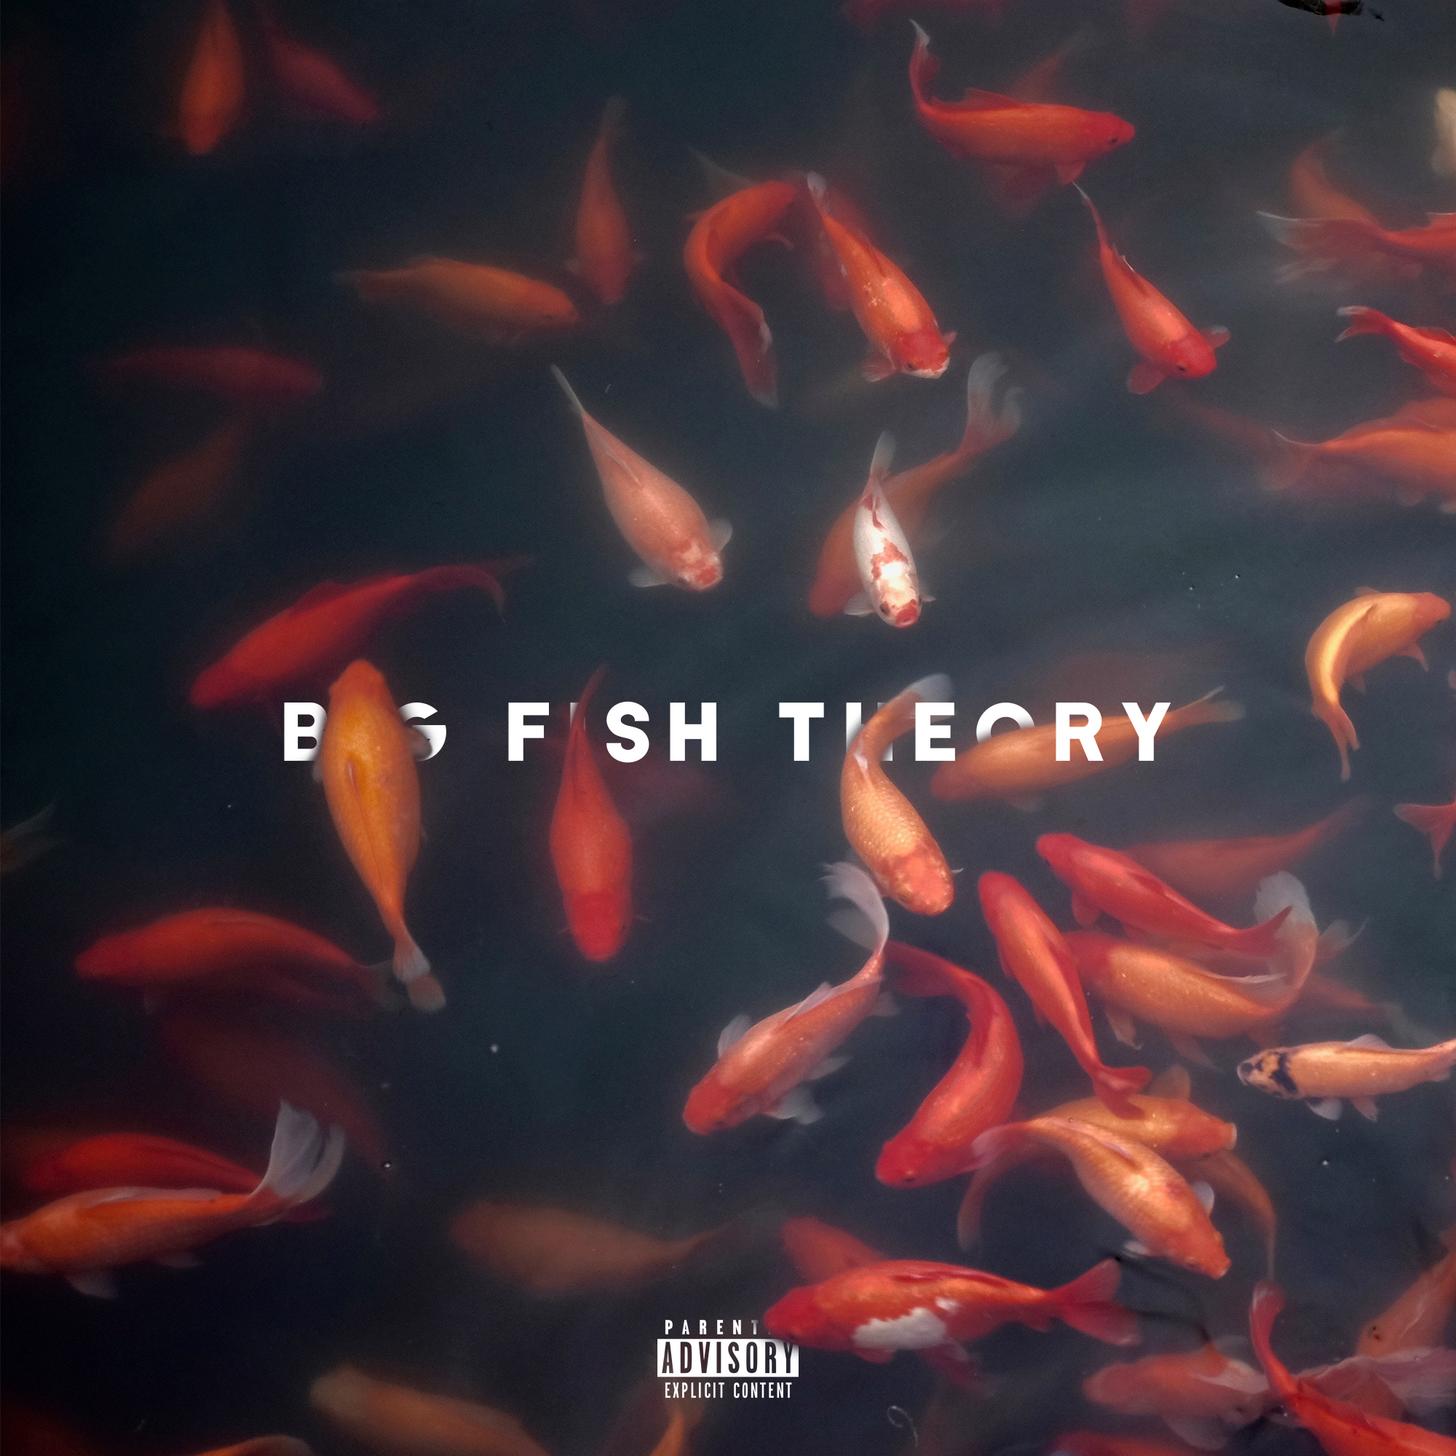 Vince Staples Big Fish Theory 2000x2000 Vince Staples Album Cover Design Album Design